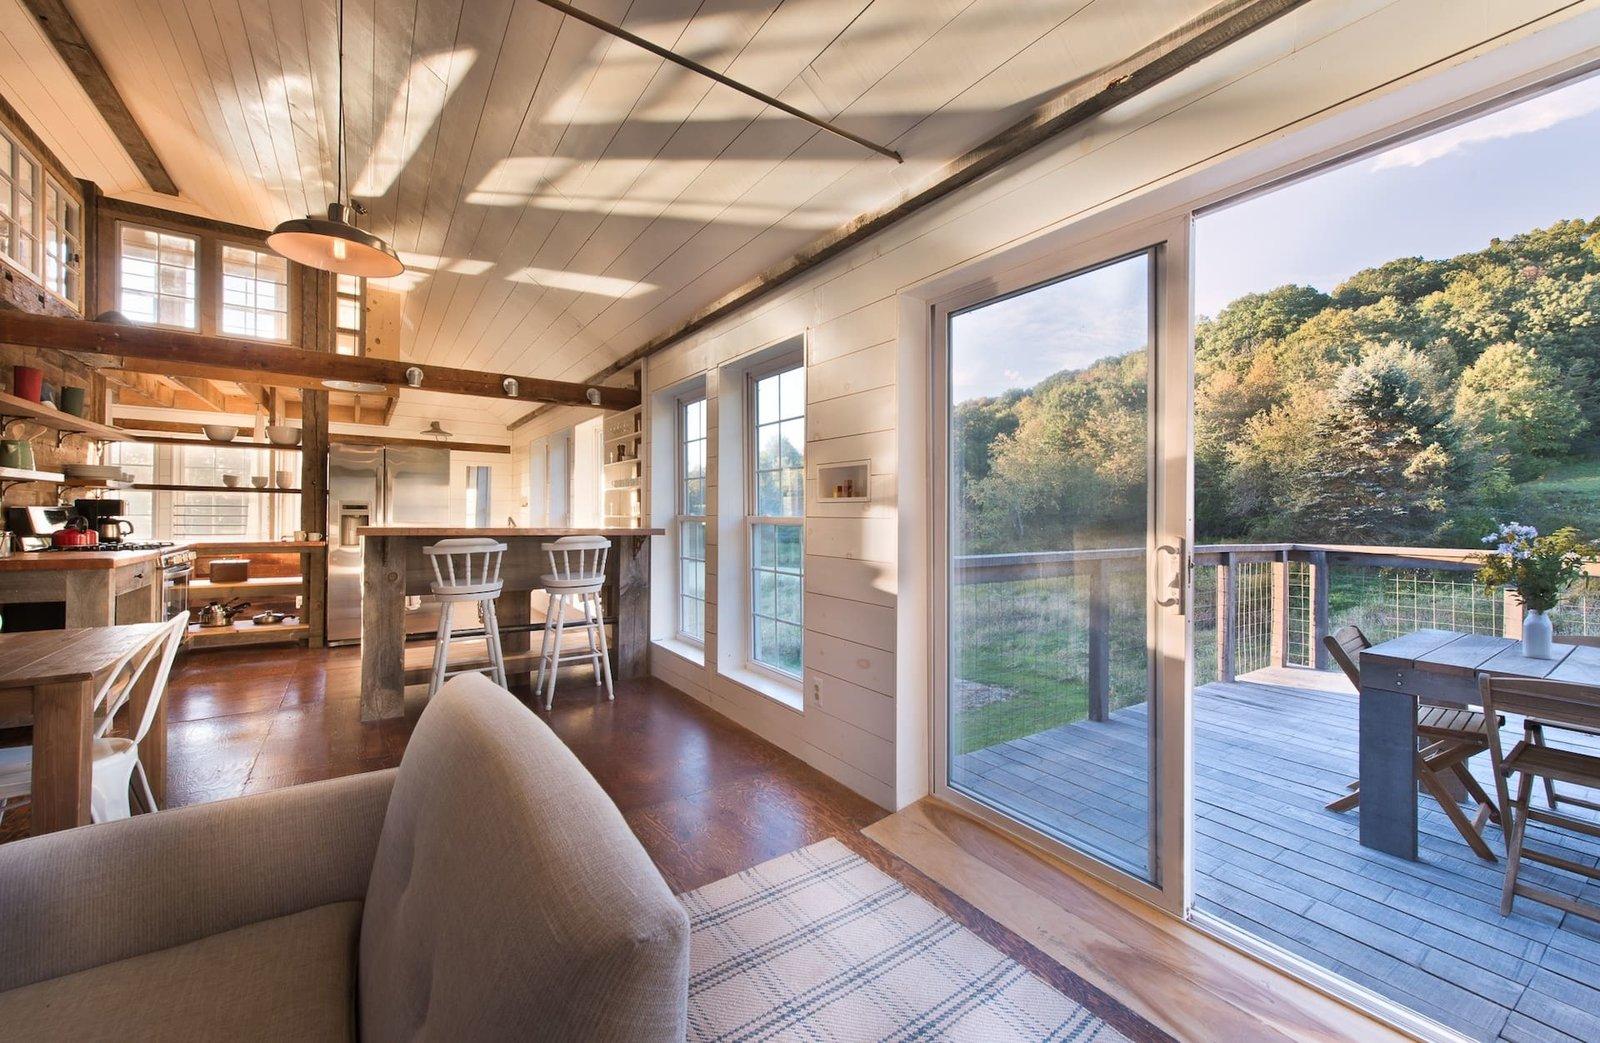 14 best upstate new york airbnbs